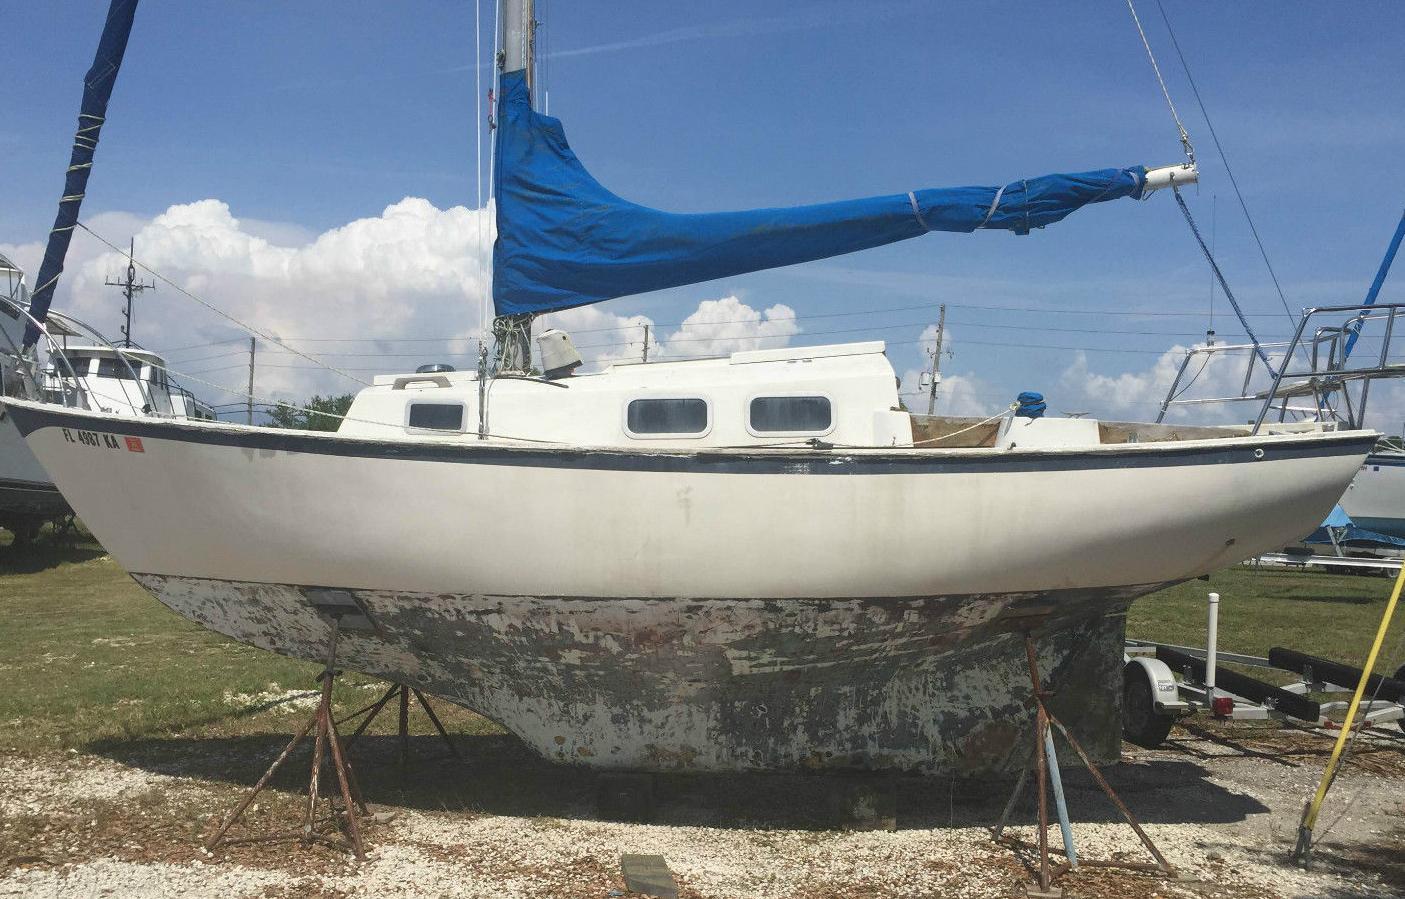 Sold 1966 Bristol Coursair Sail Star 24 Sailboat